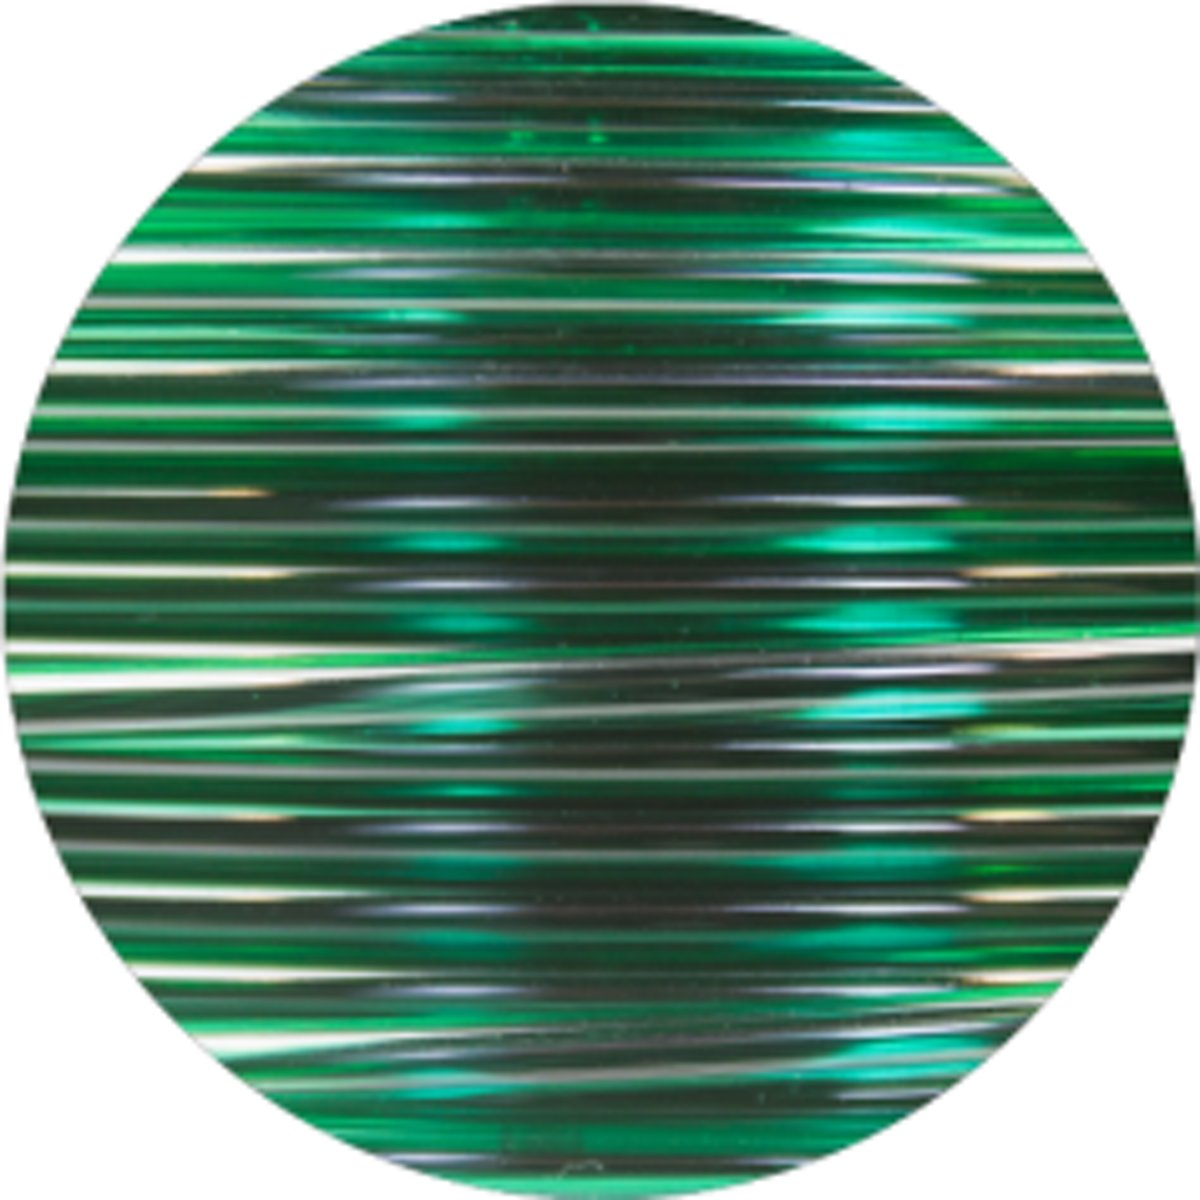 NGEN GREEN TRANSPARENT 2.85 / 750